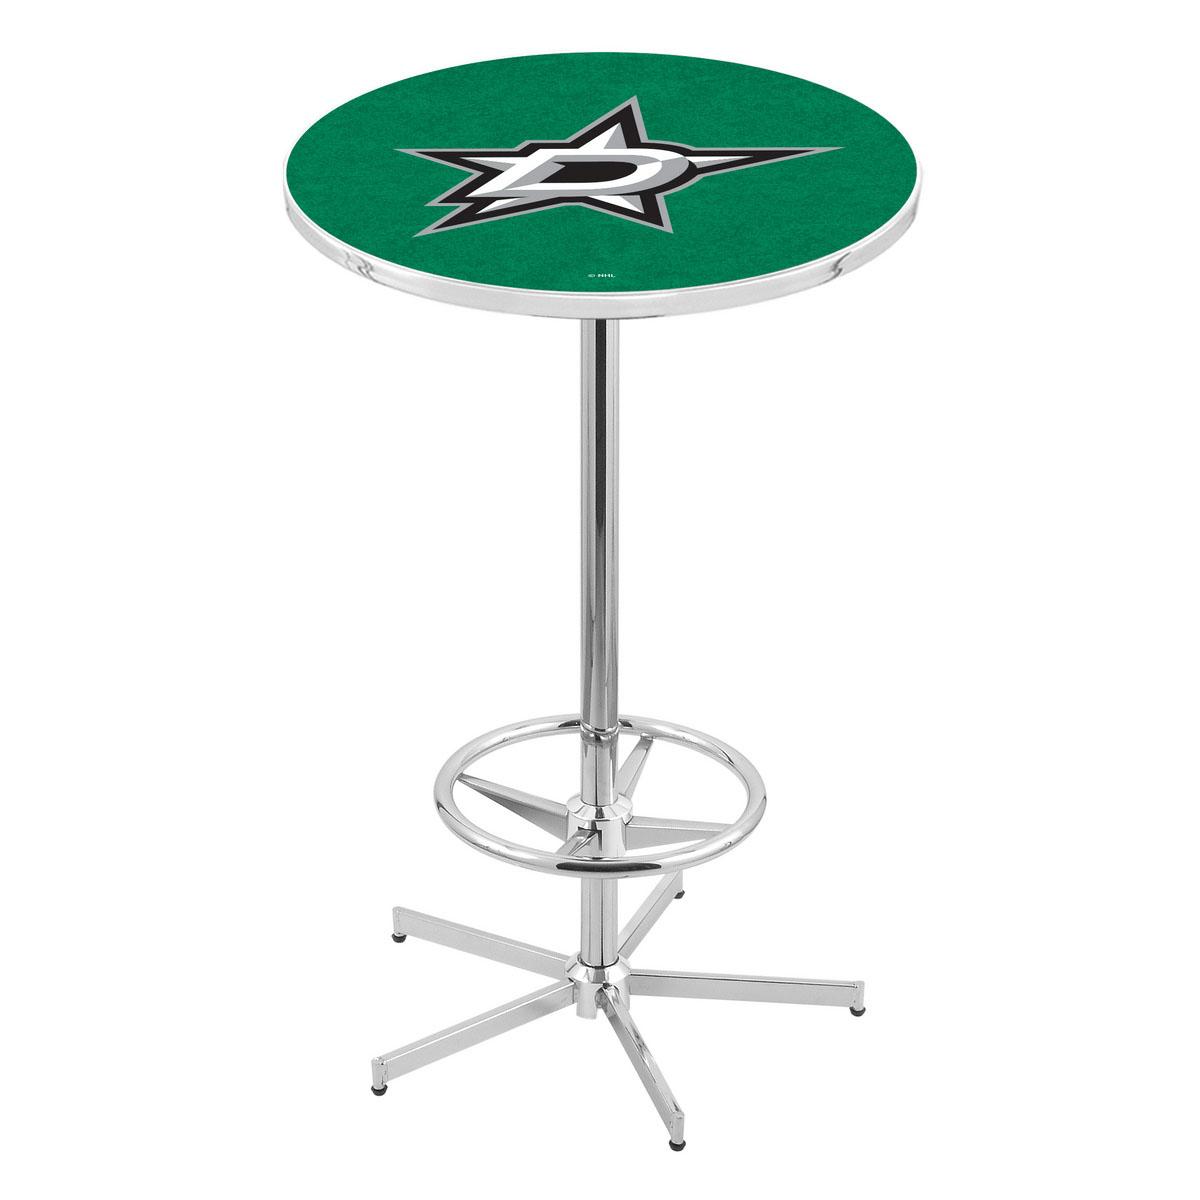 Impressive Chrome Dallas Stars Pub Table Product Photo